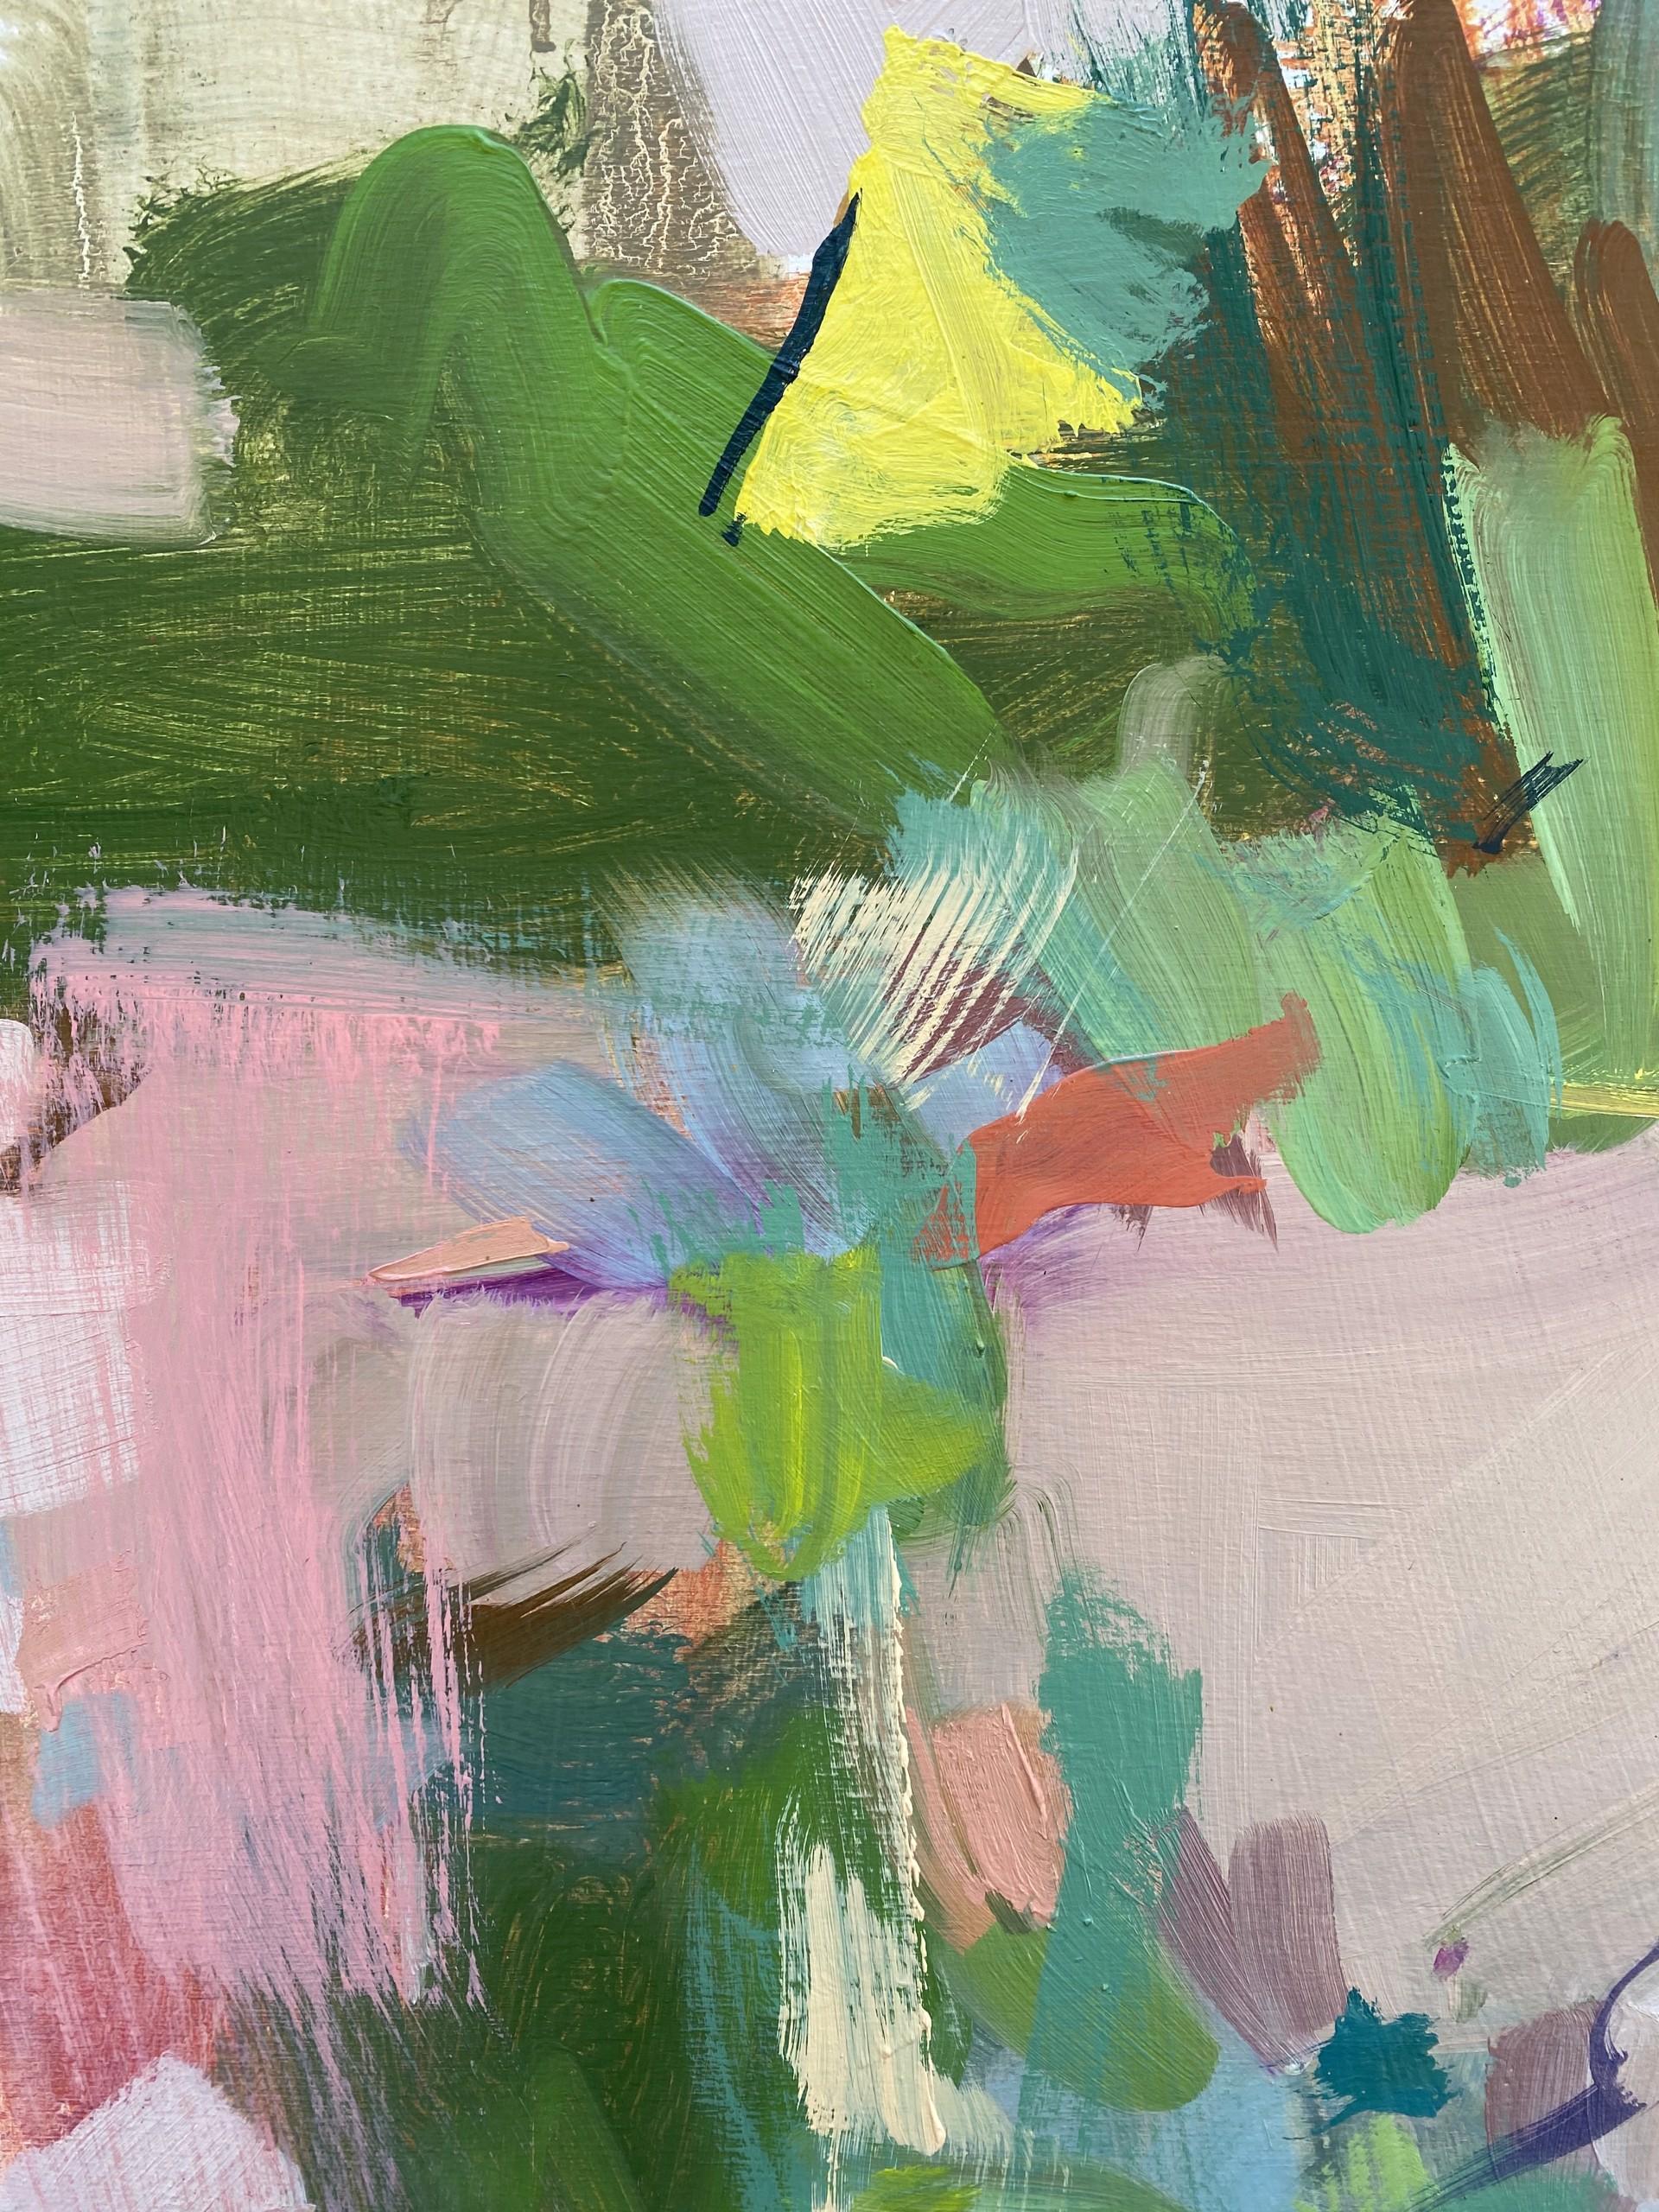 Cherry Shake With Whip by Marissa Vogl